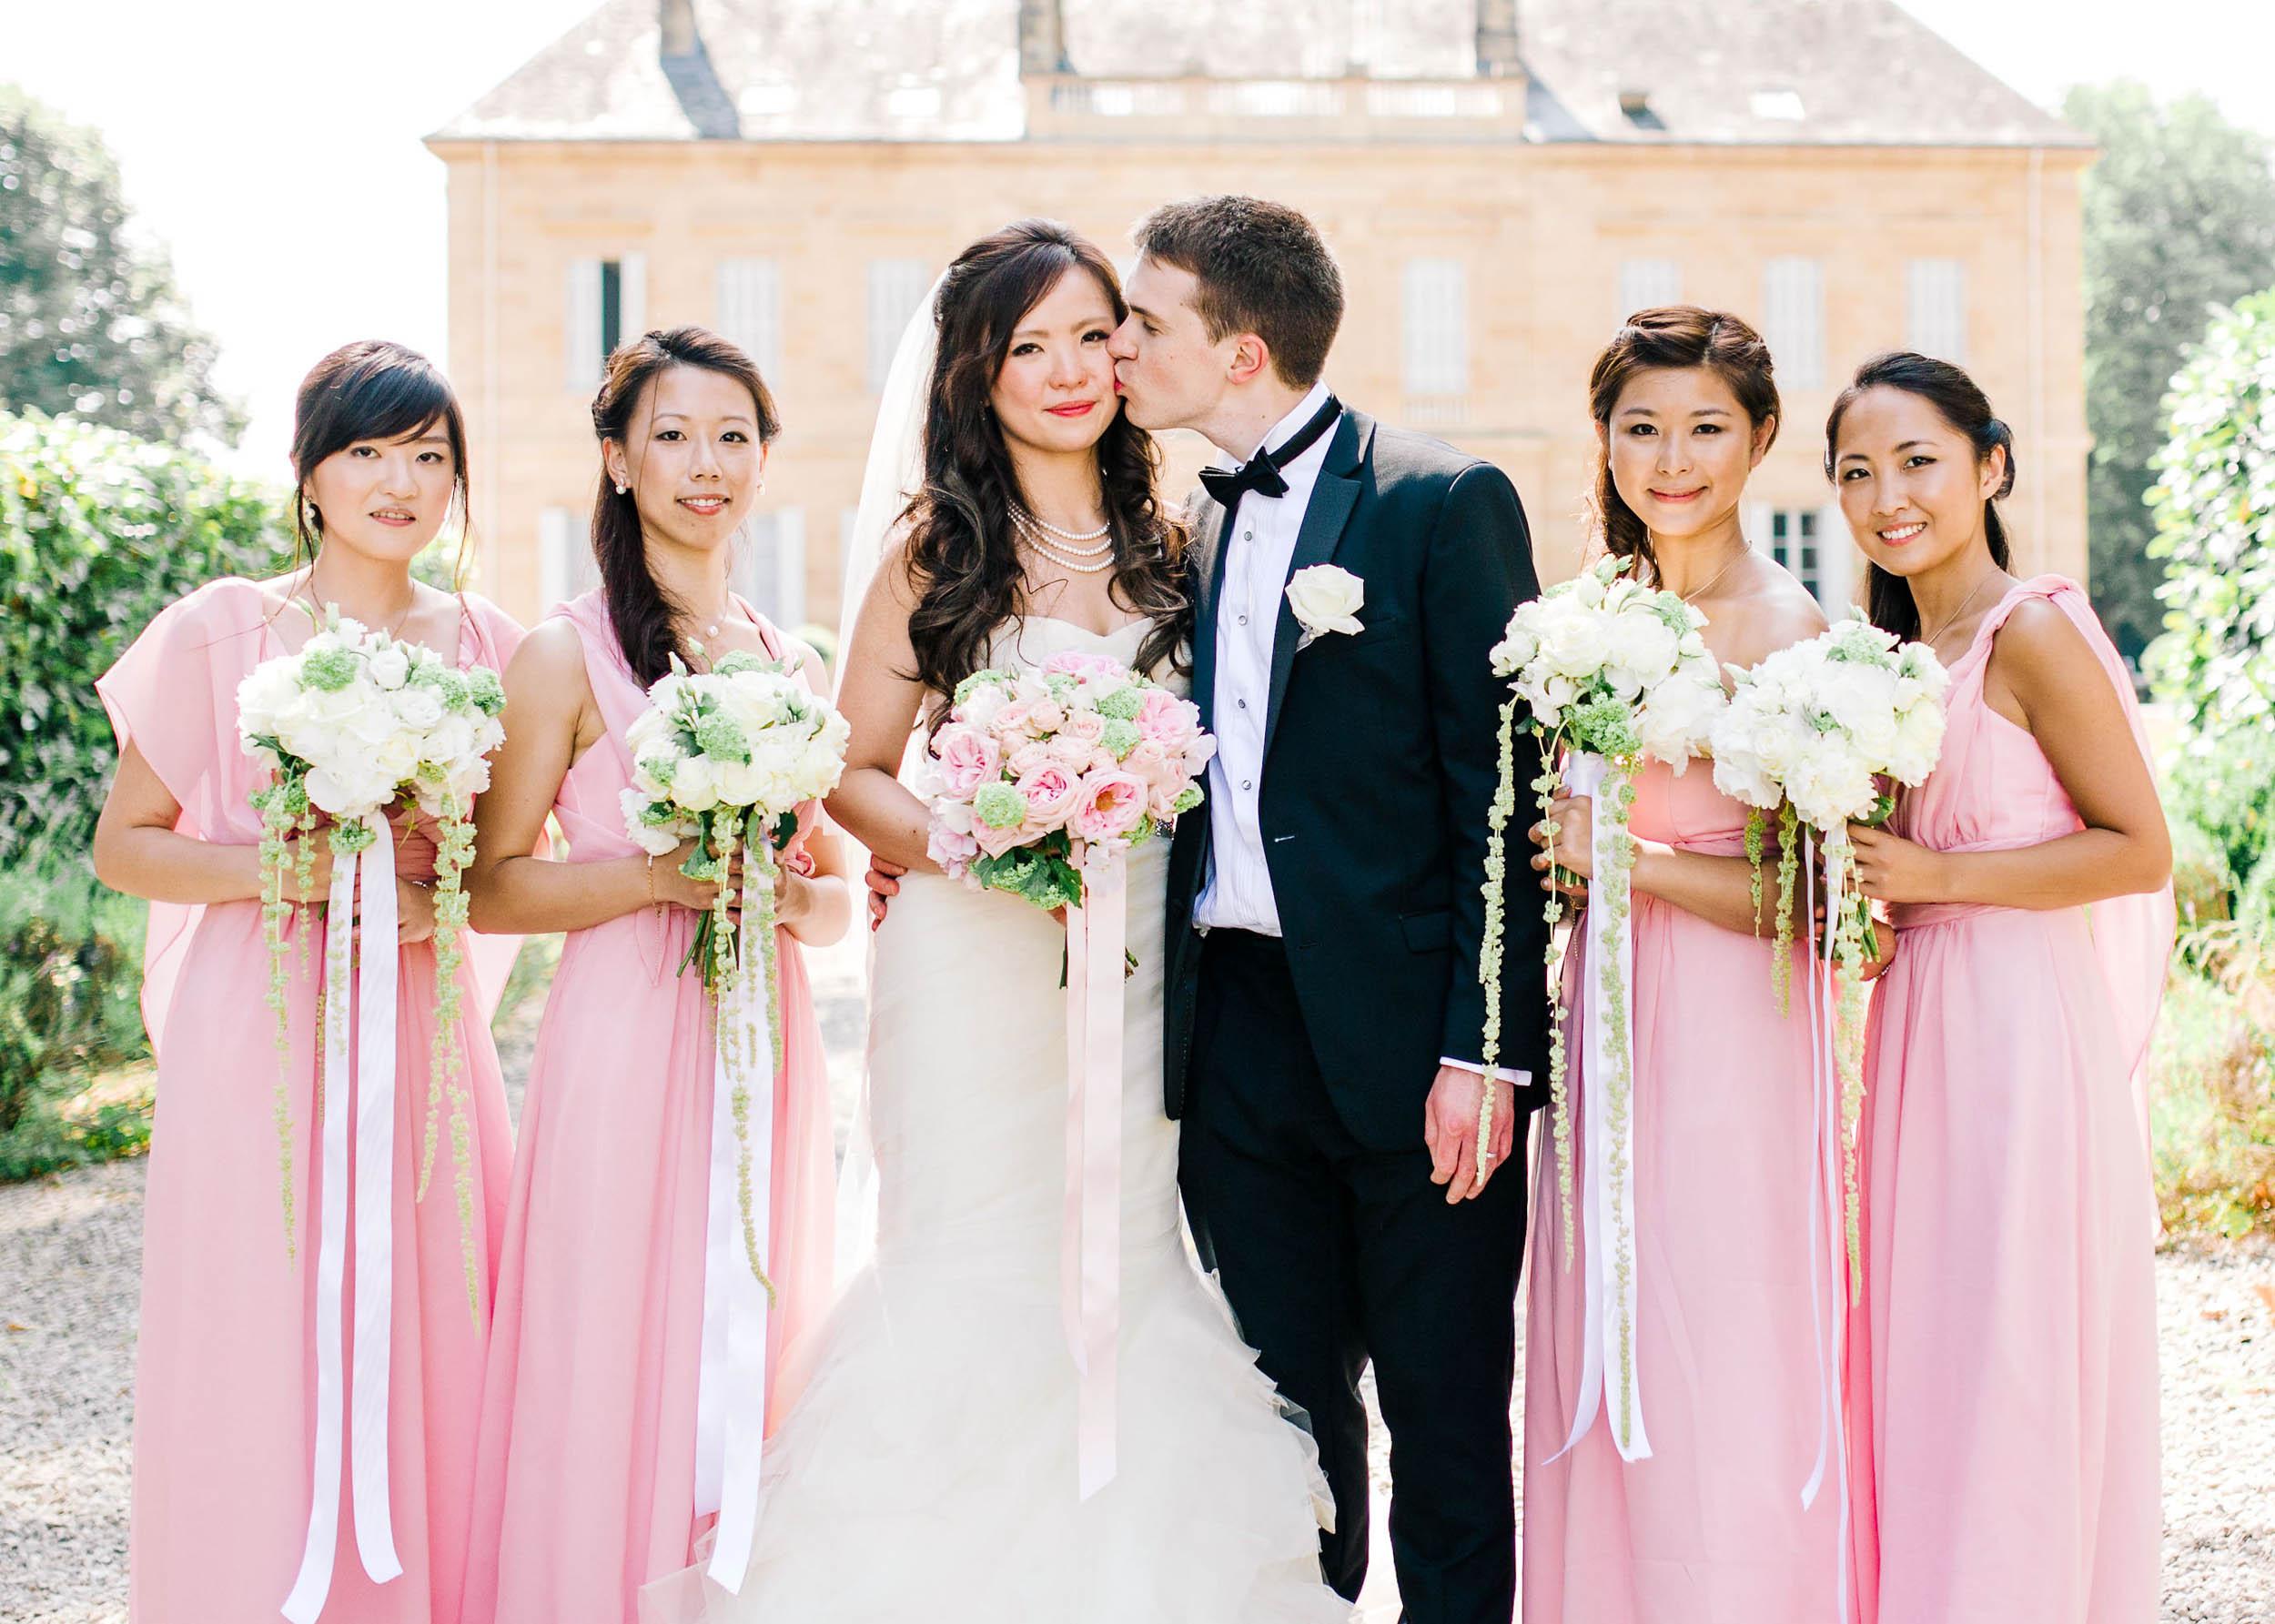 Amy O'Boyle Photography- Destination & UK Fine Art Film Wedding Photographer- Chateau La Durantie Wedding-22.jpg